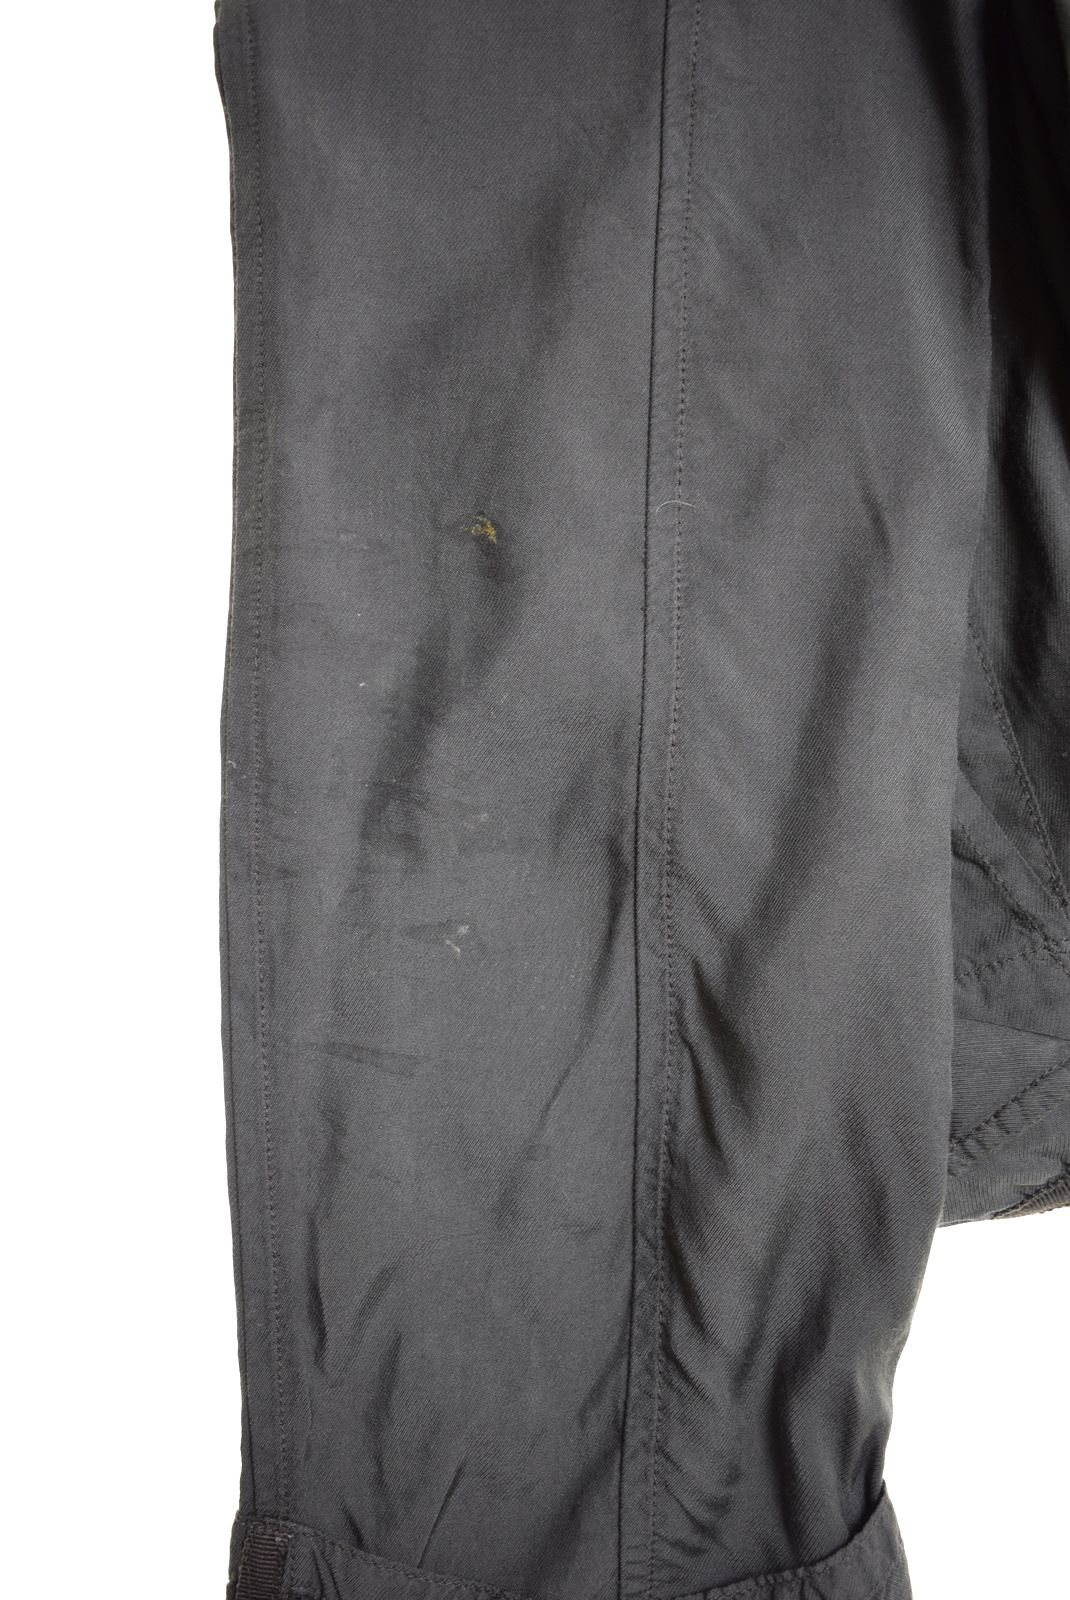 0d69f6e0d5 LIU JO Womens Cargo Trousers Size 40 W30 L29 Khaki Viscose JT21 | eBay